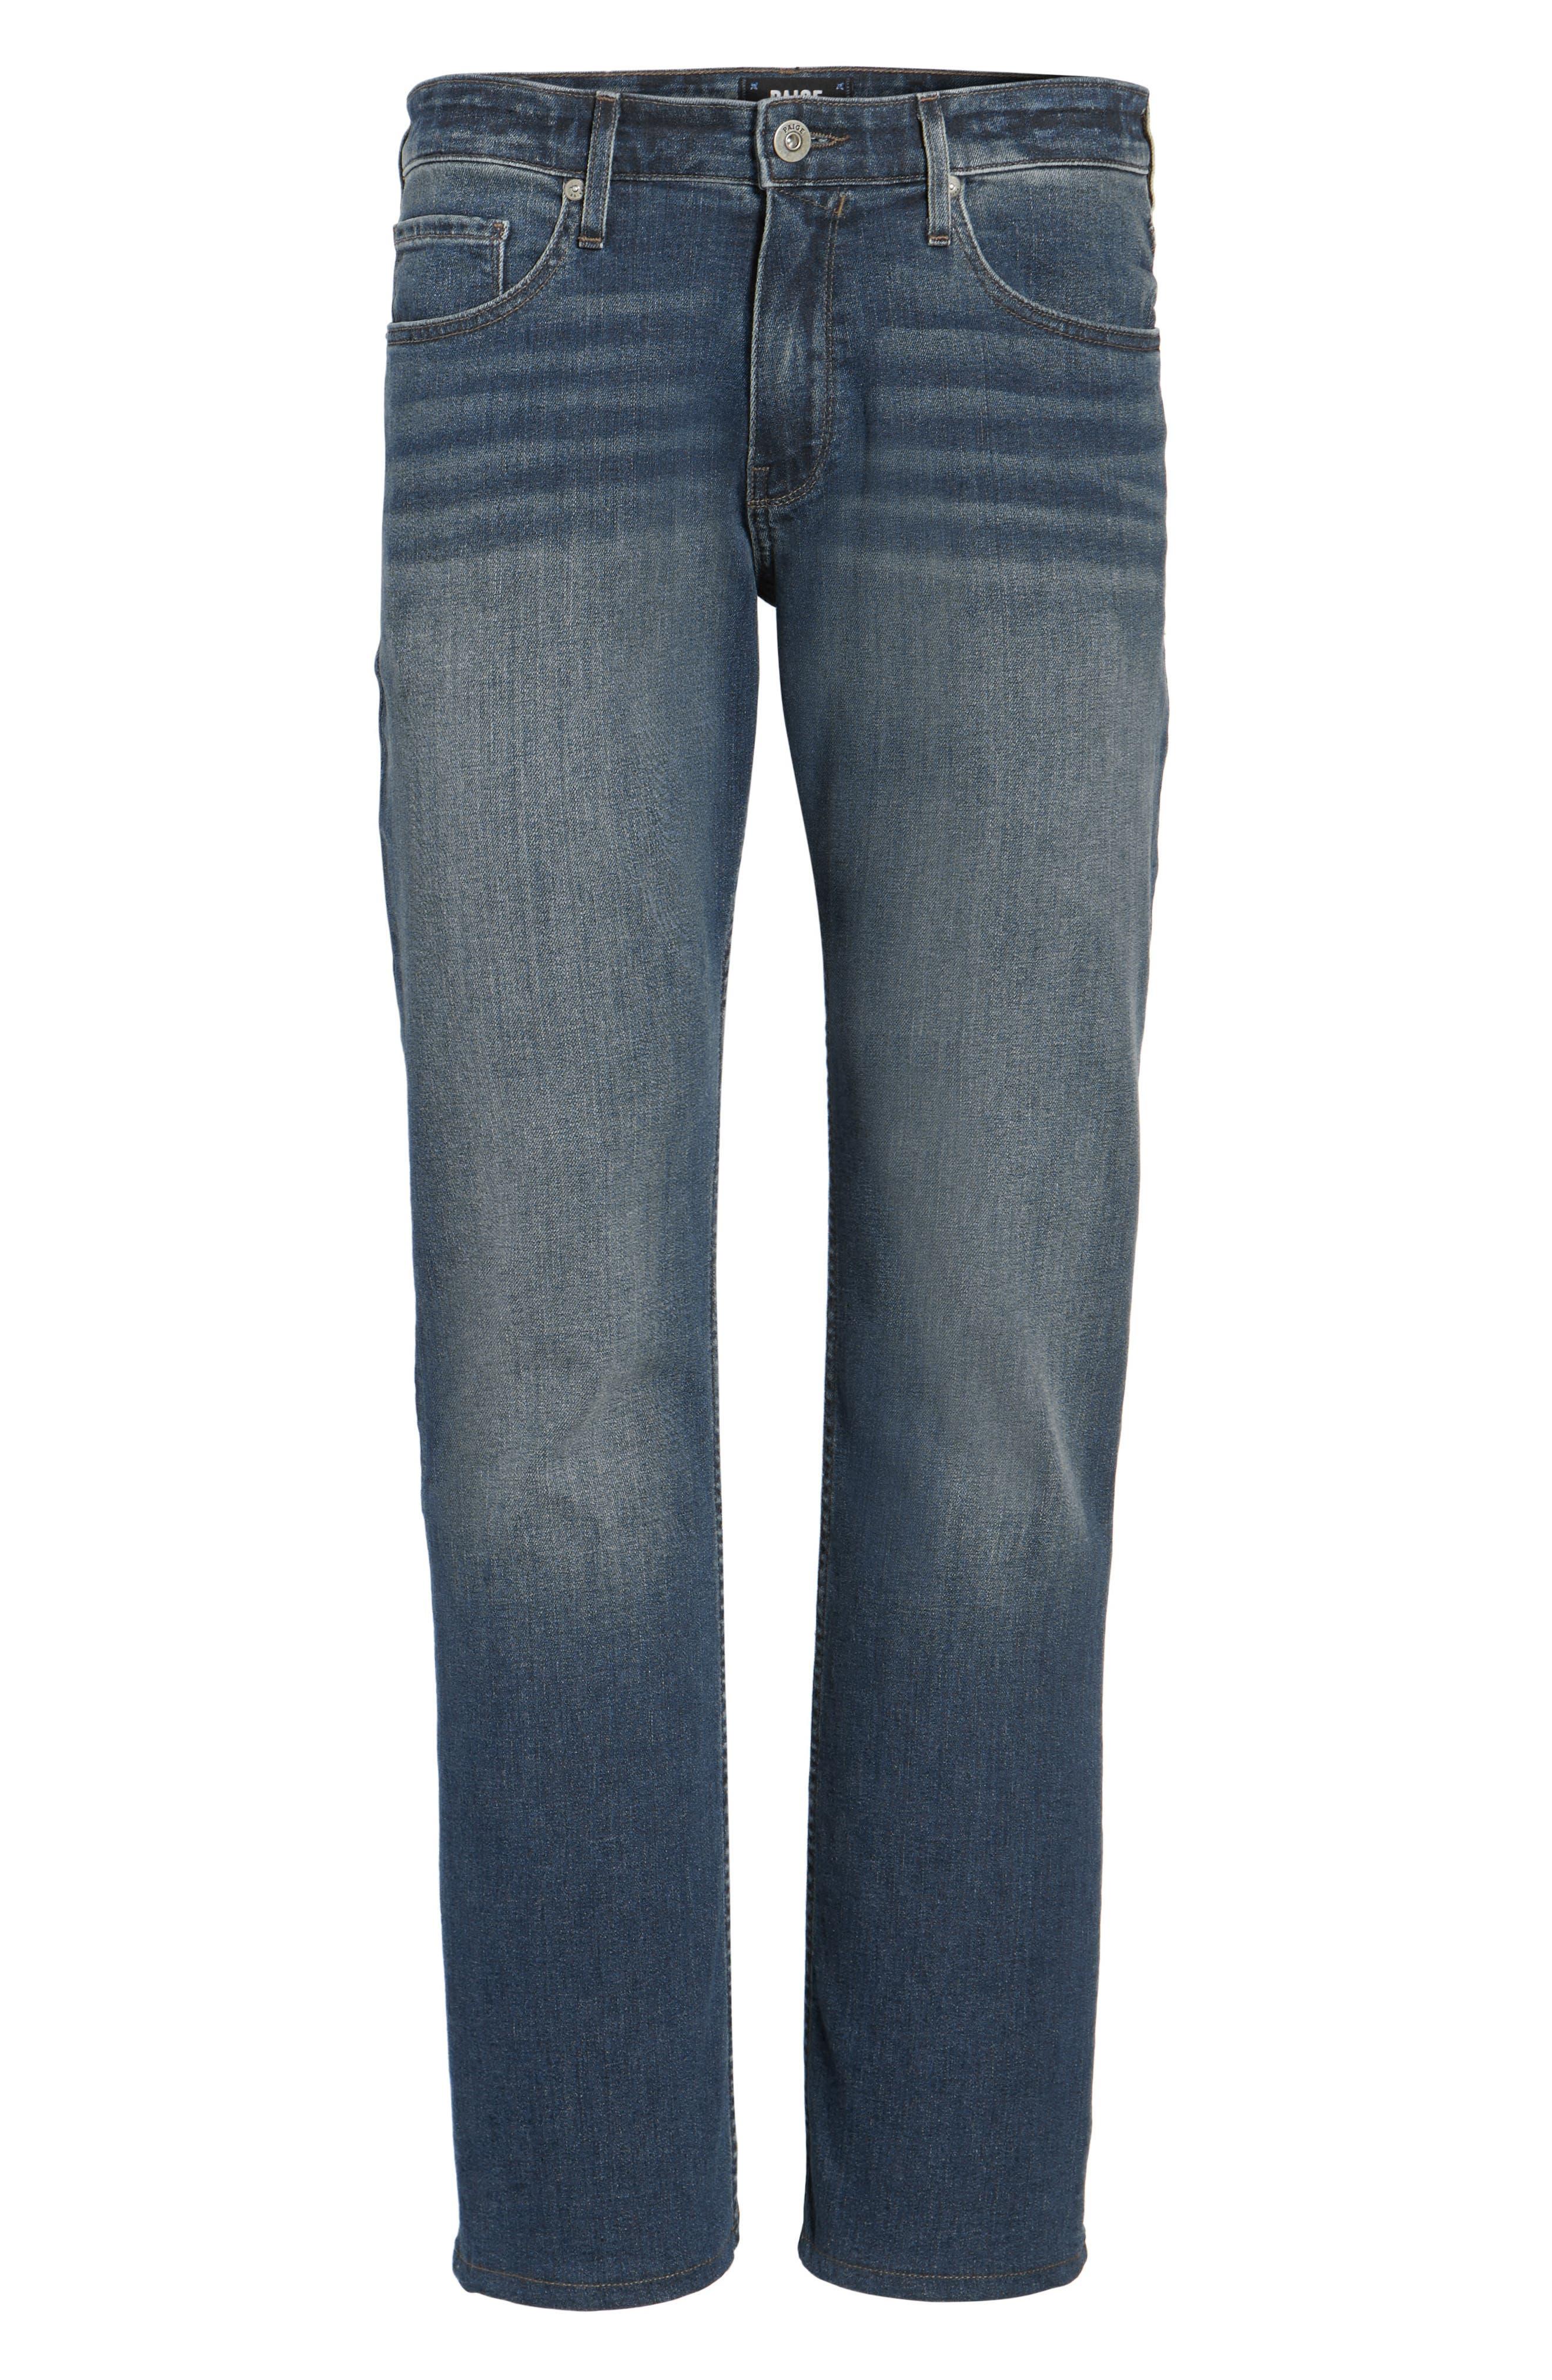 Normandie Straight Leg Jeans,                             Alternate thumbnail 6, color,                             400